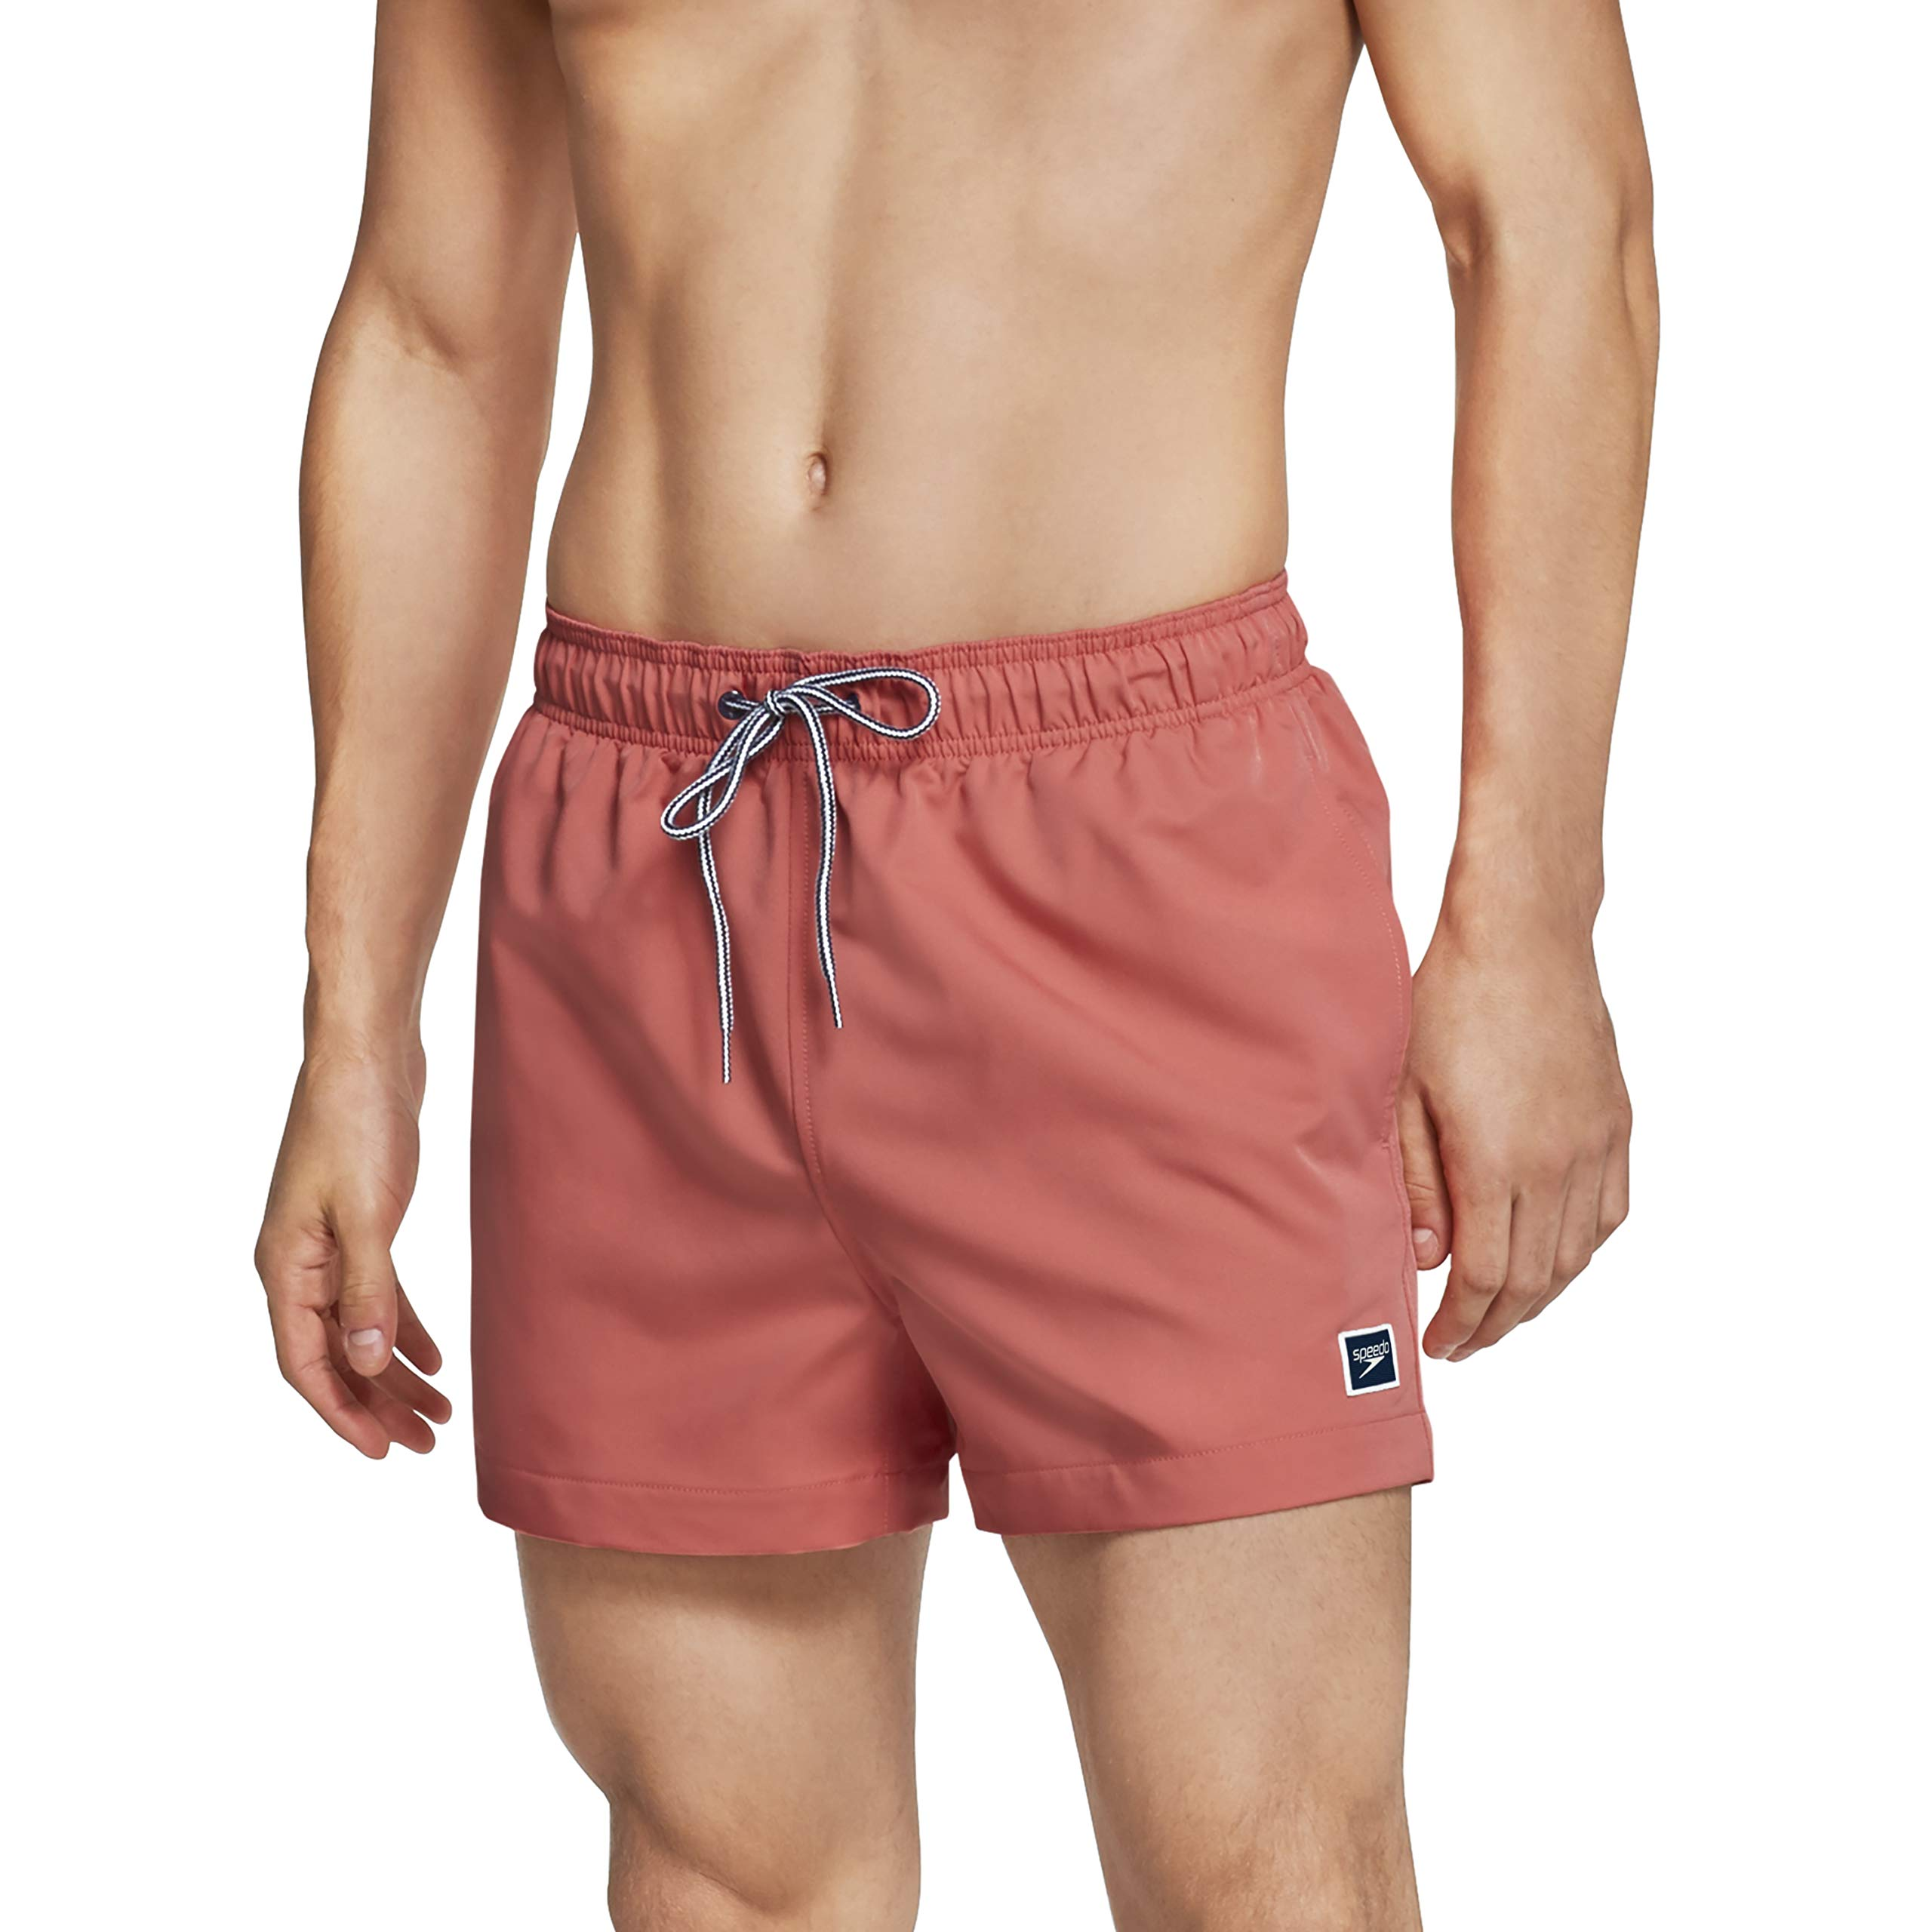 Speedo Men's Swim Trunk Short Length Redondo Solid